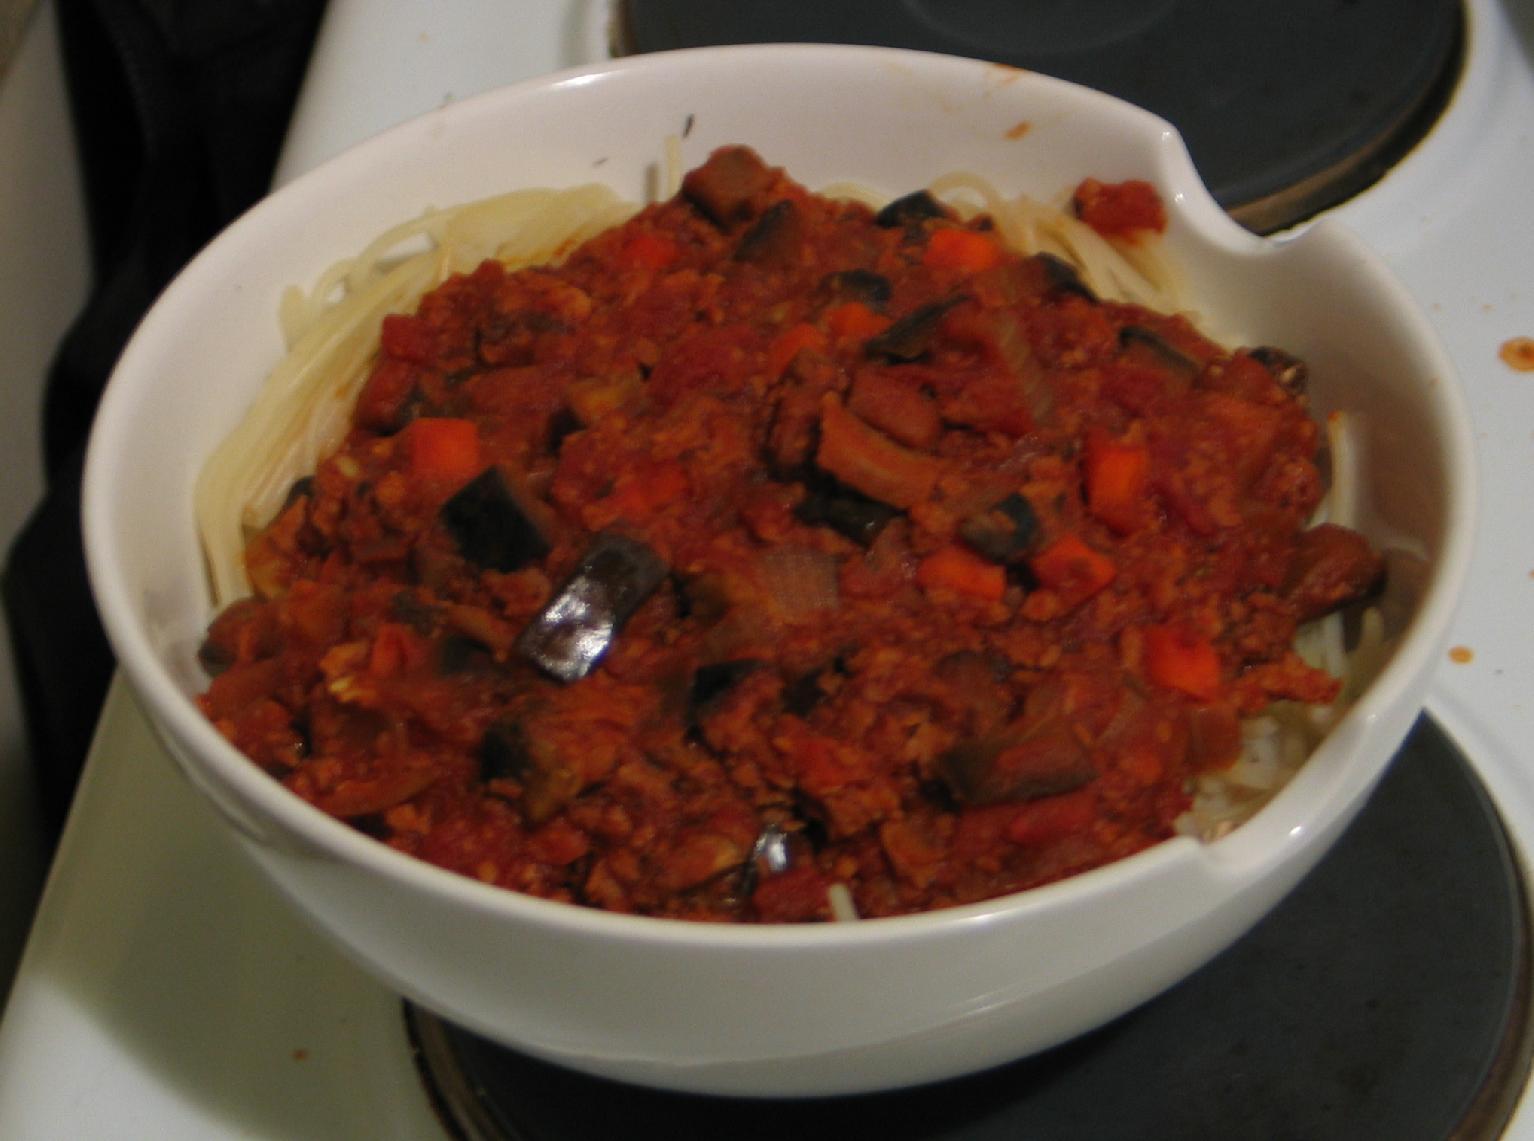 vegan gluten-free spaghetti bolognaise